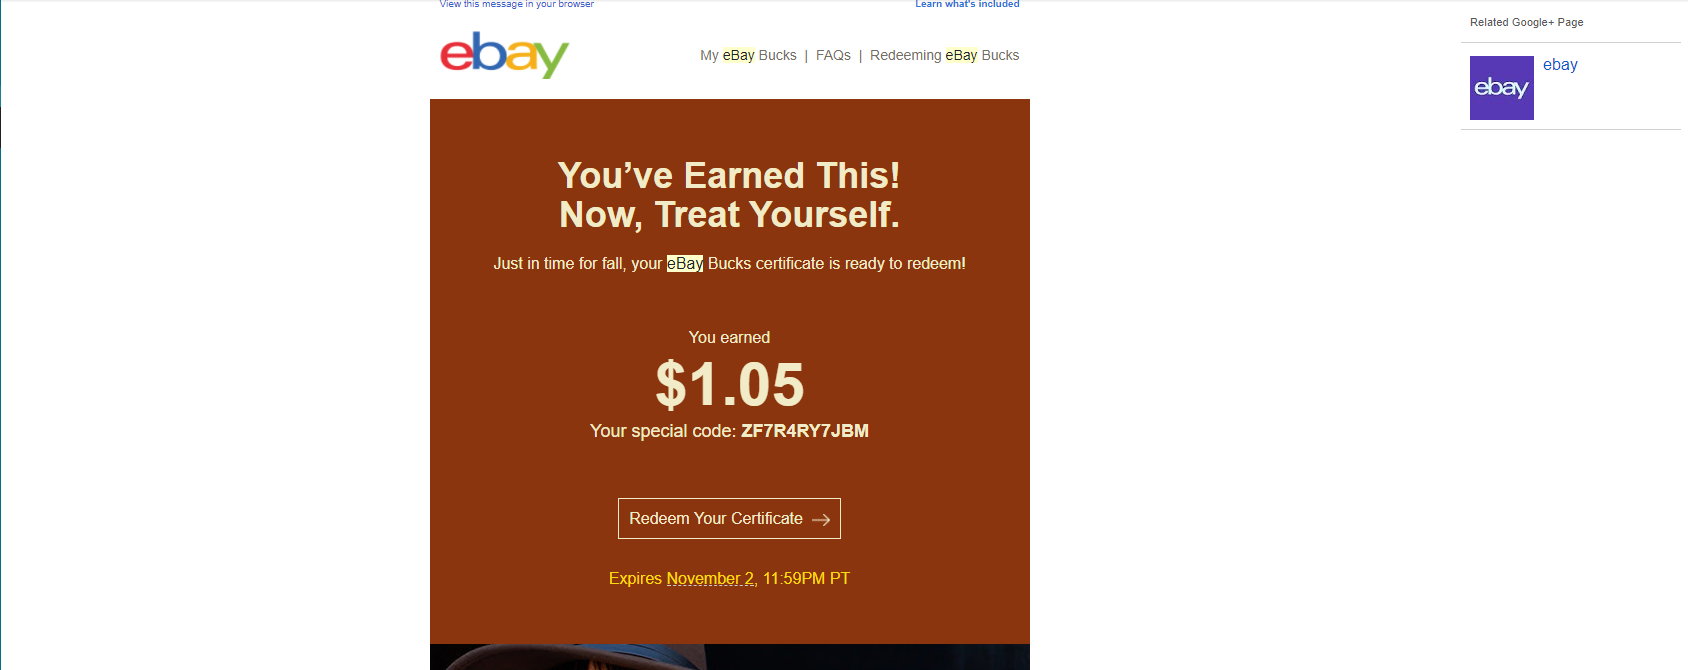 Ebay Bucks Certificate Has Wrong Amount The Ebay Community